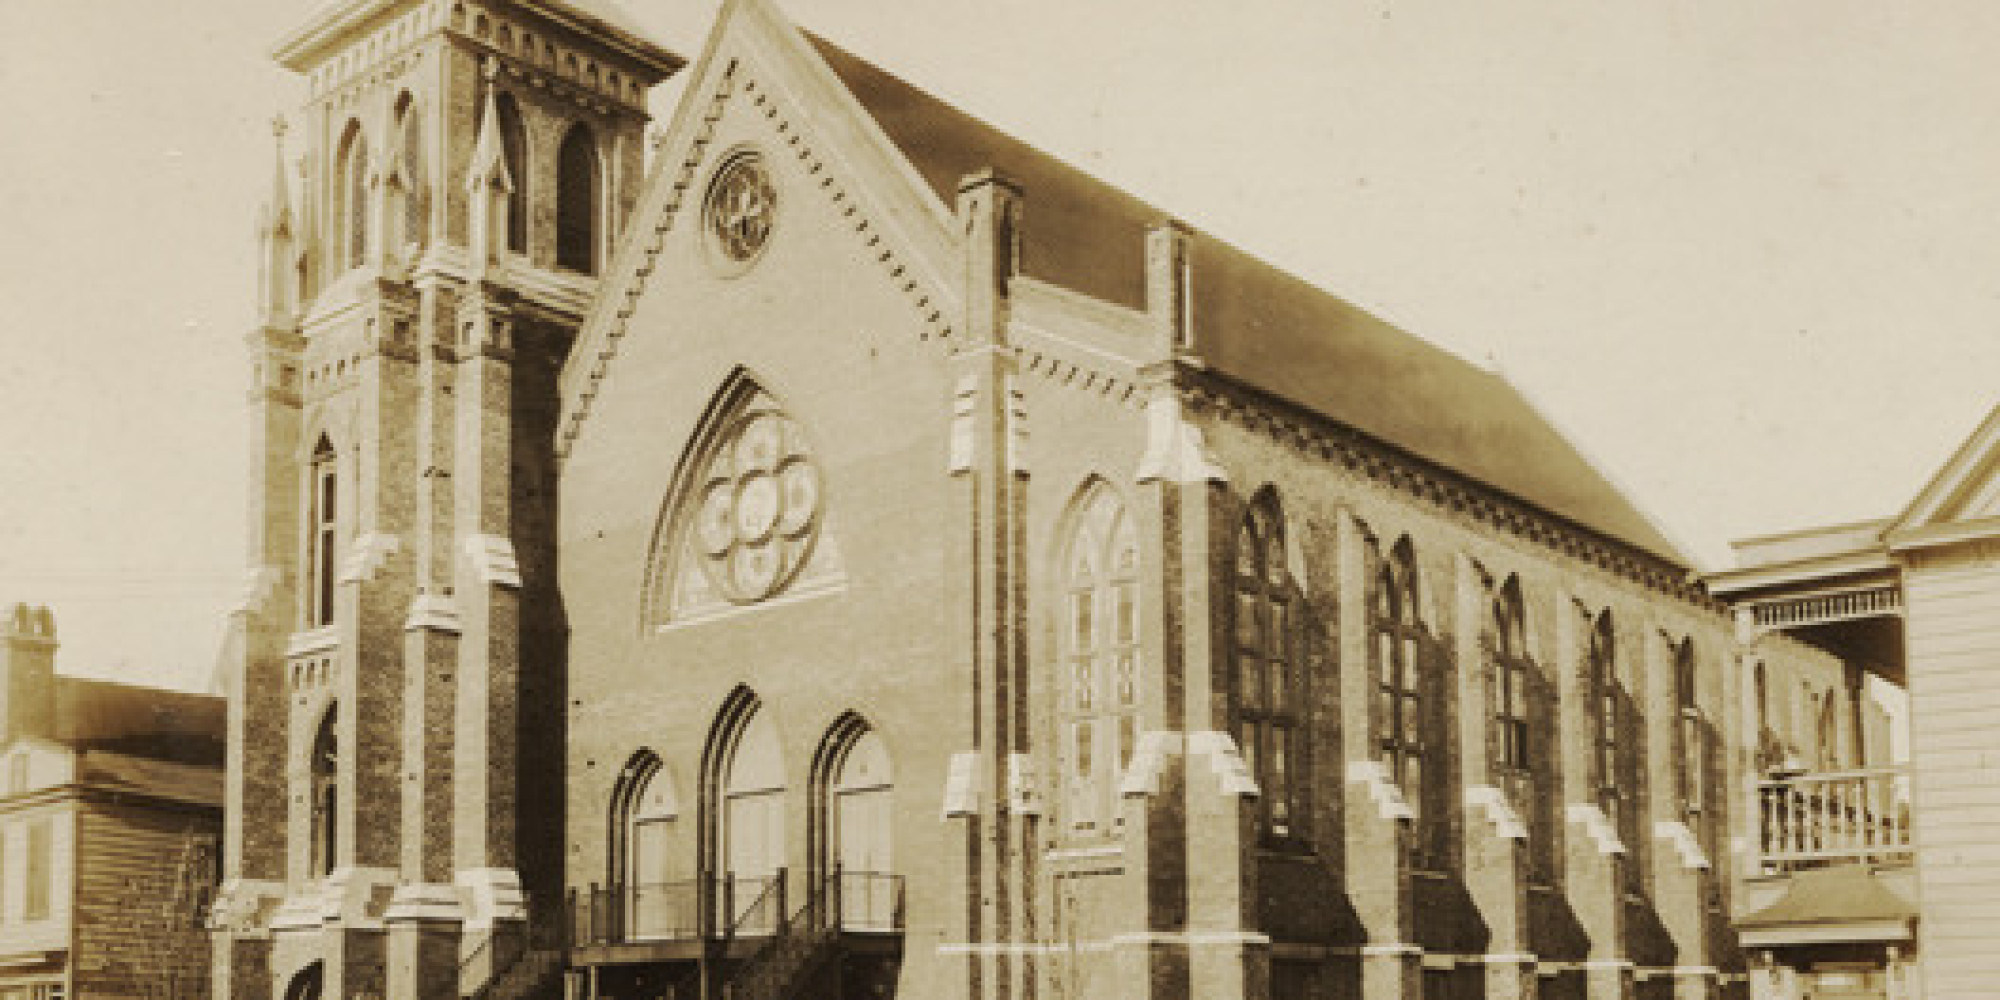 historic black church attacked in charleston had deep roots in historic black church attacked in charleston had deep roots in civil rights abolition the huffington post